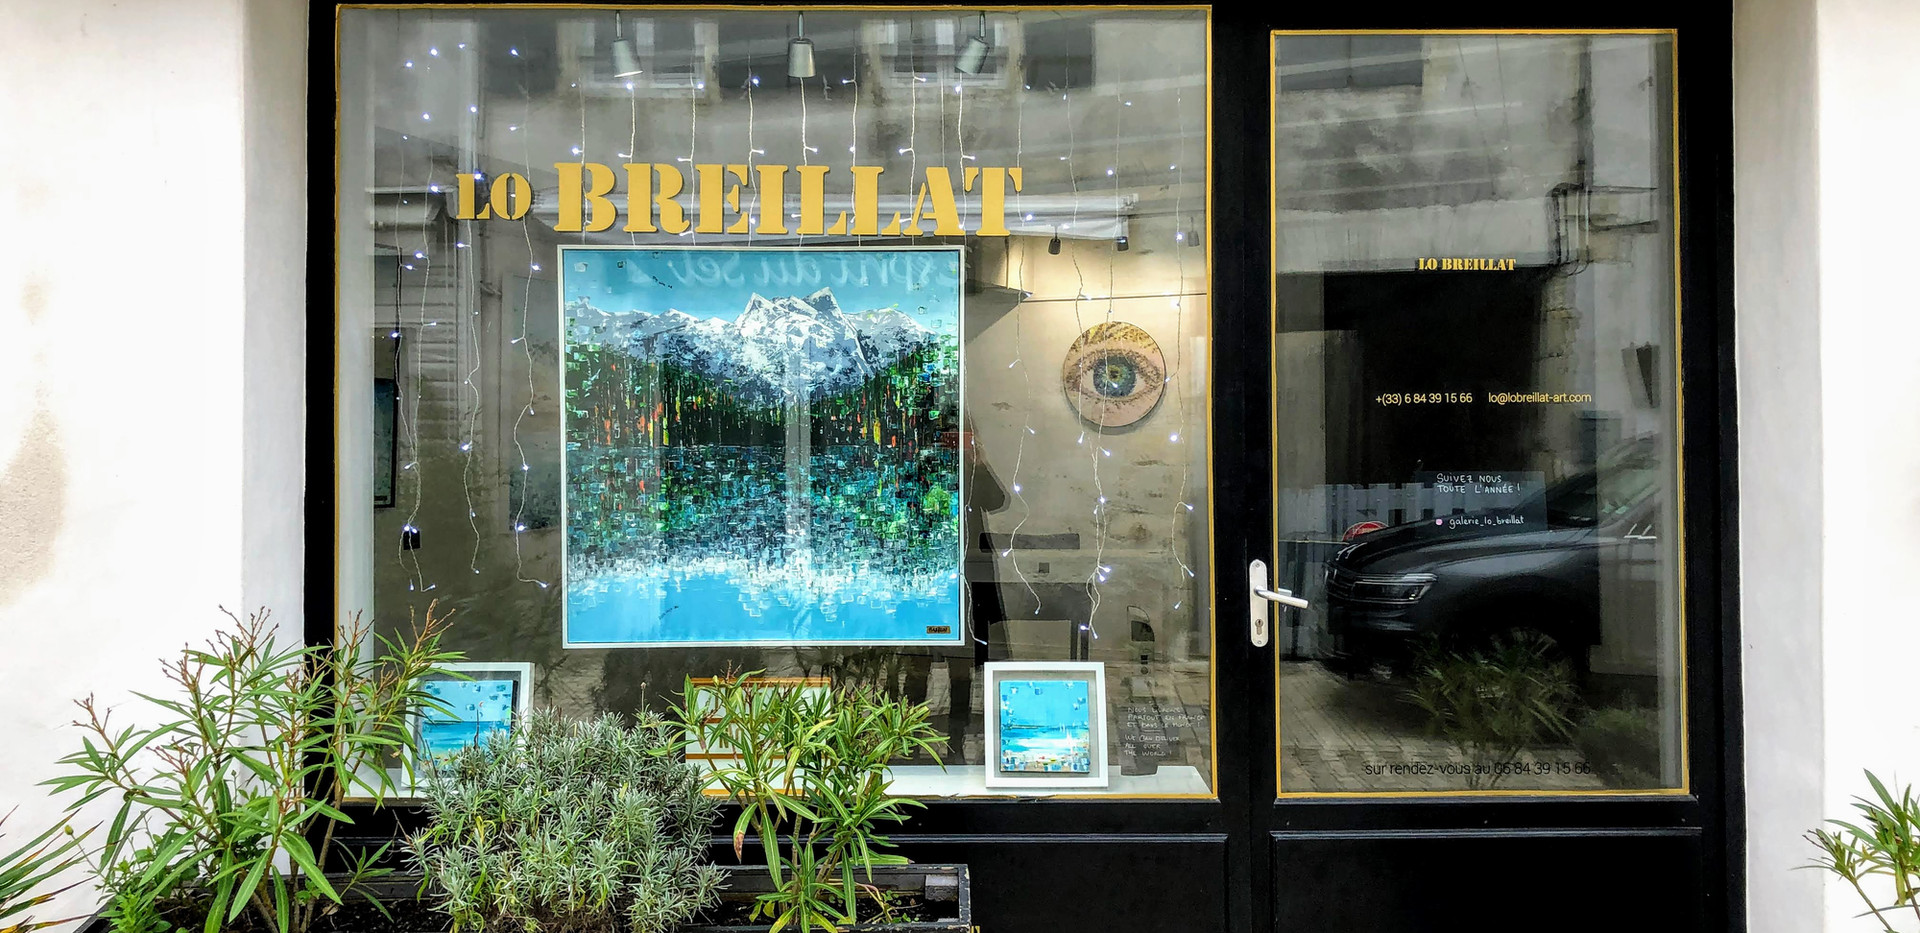 Galerie d'art Lo Breillat